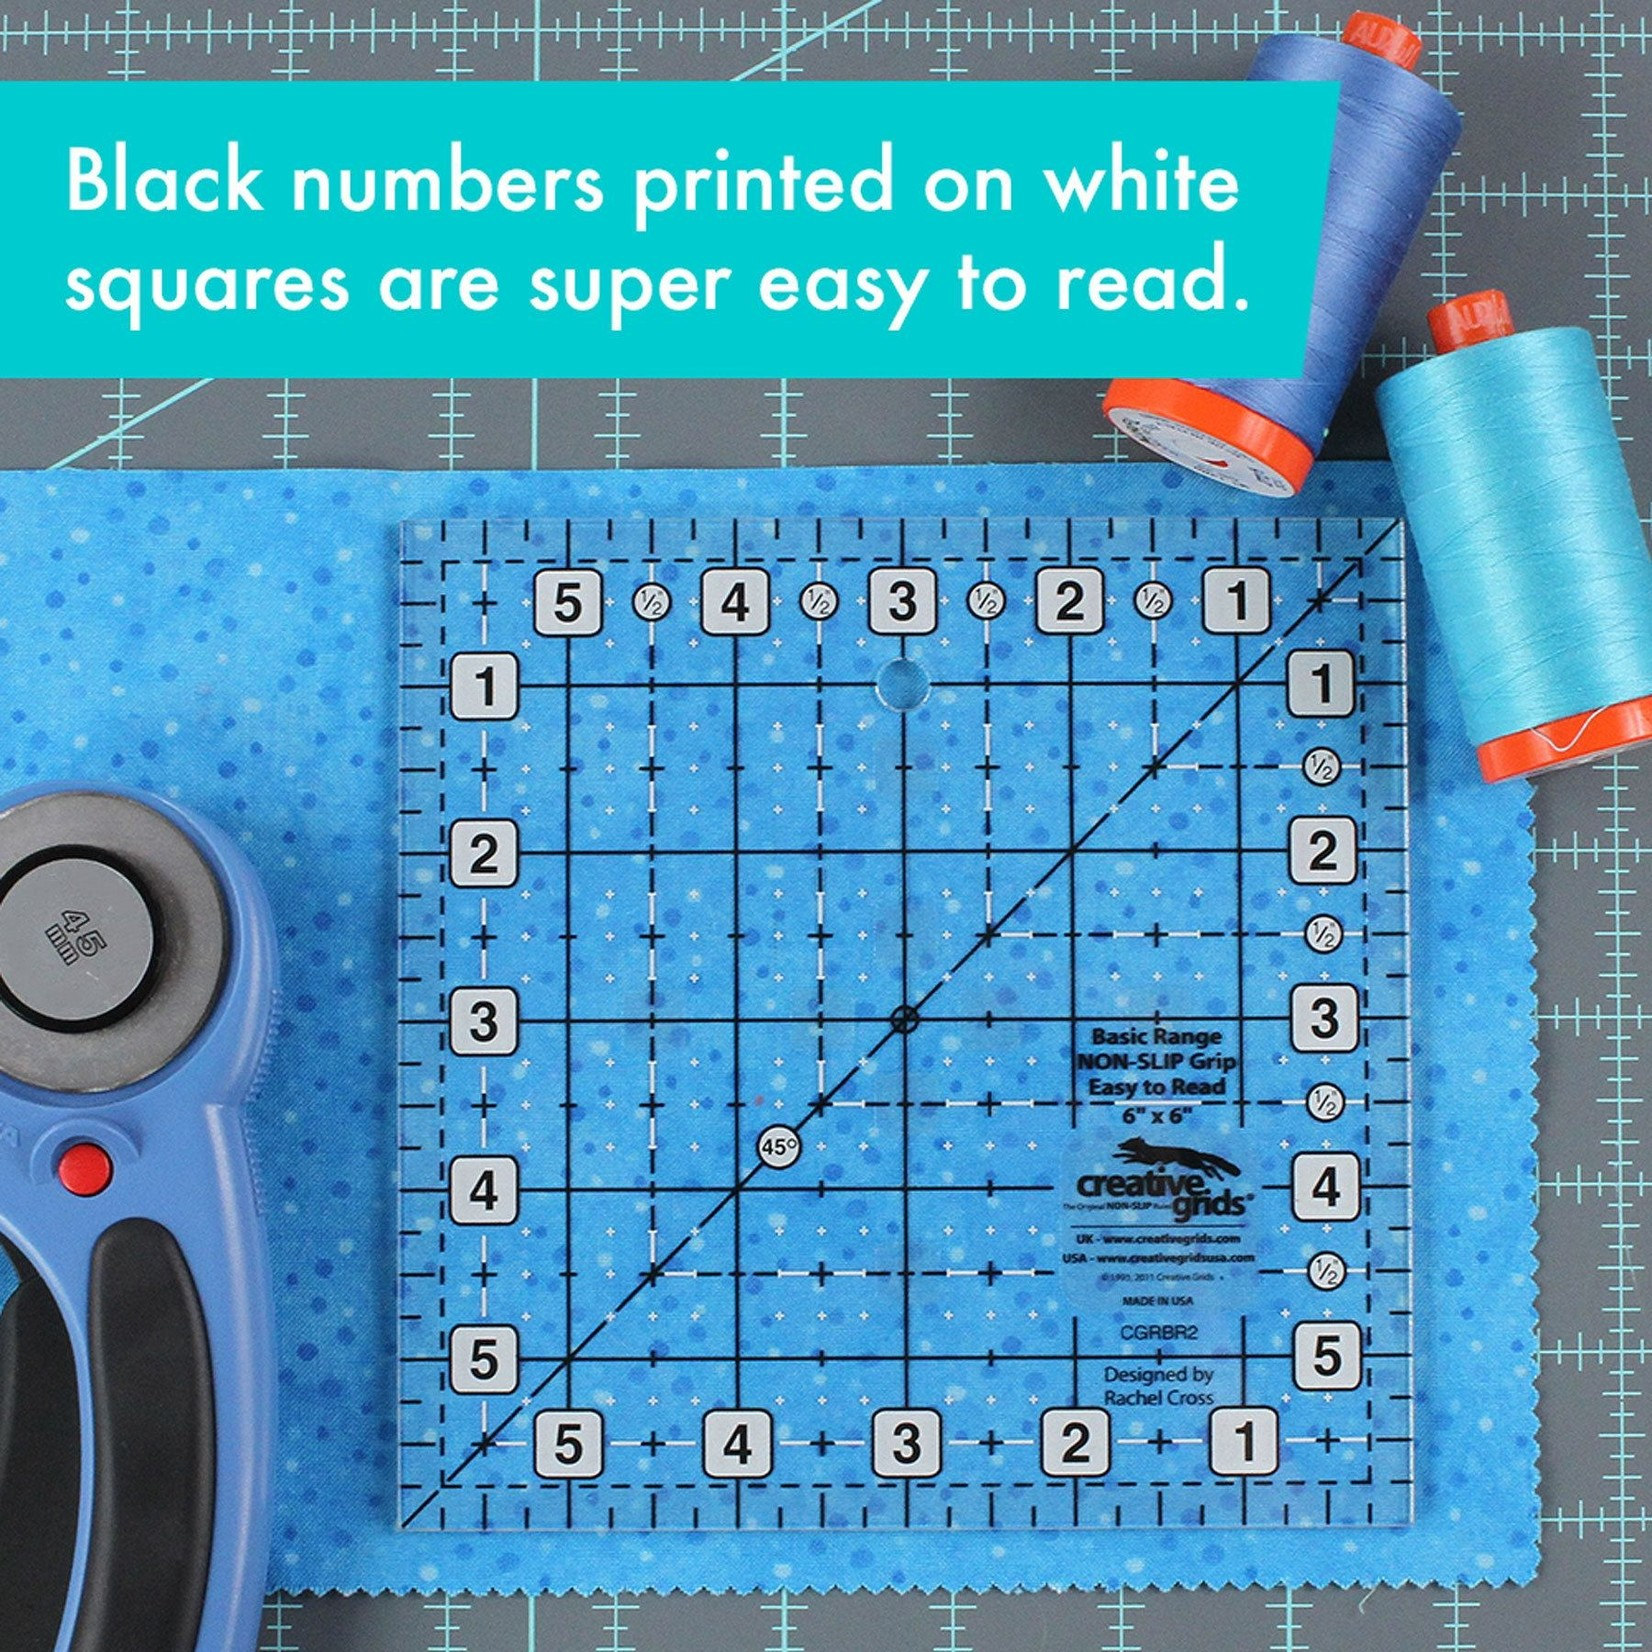 "Creative Grids Creative Grids 6"" Square CGRBR2"